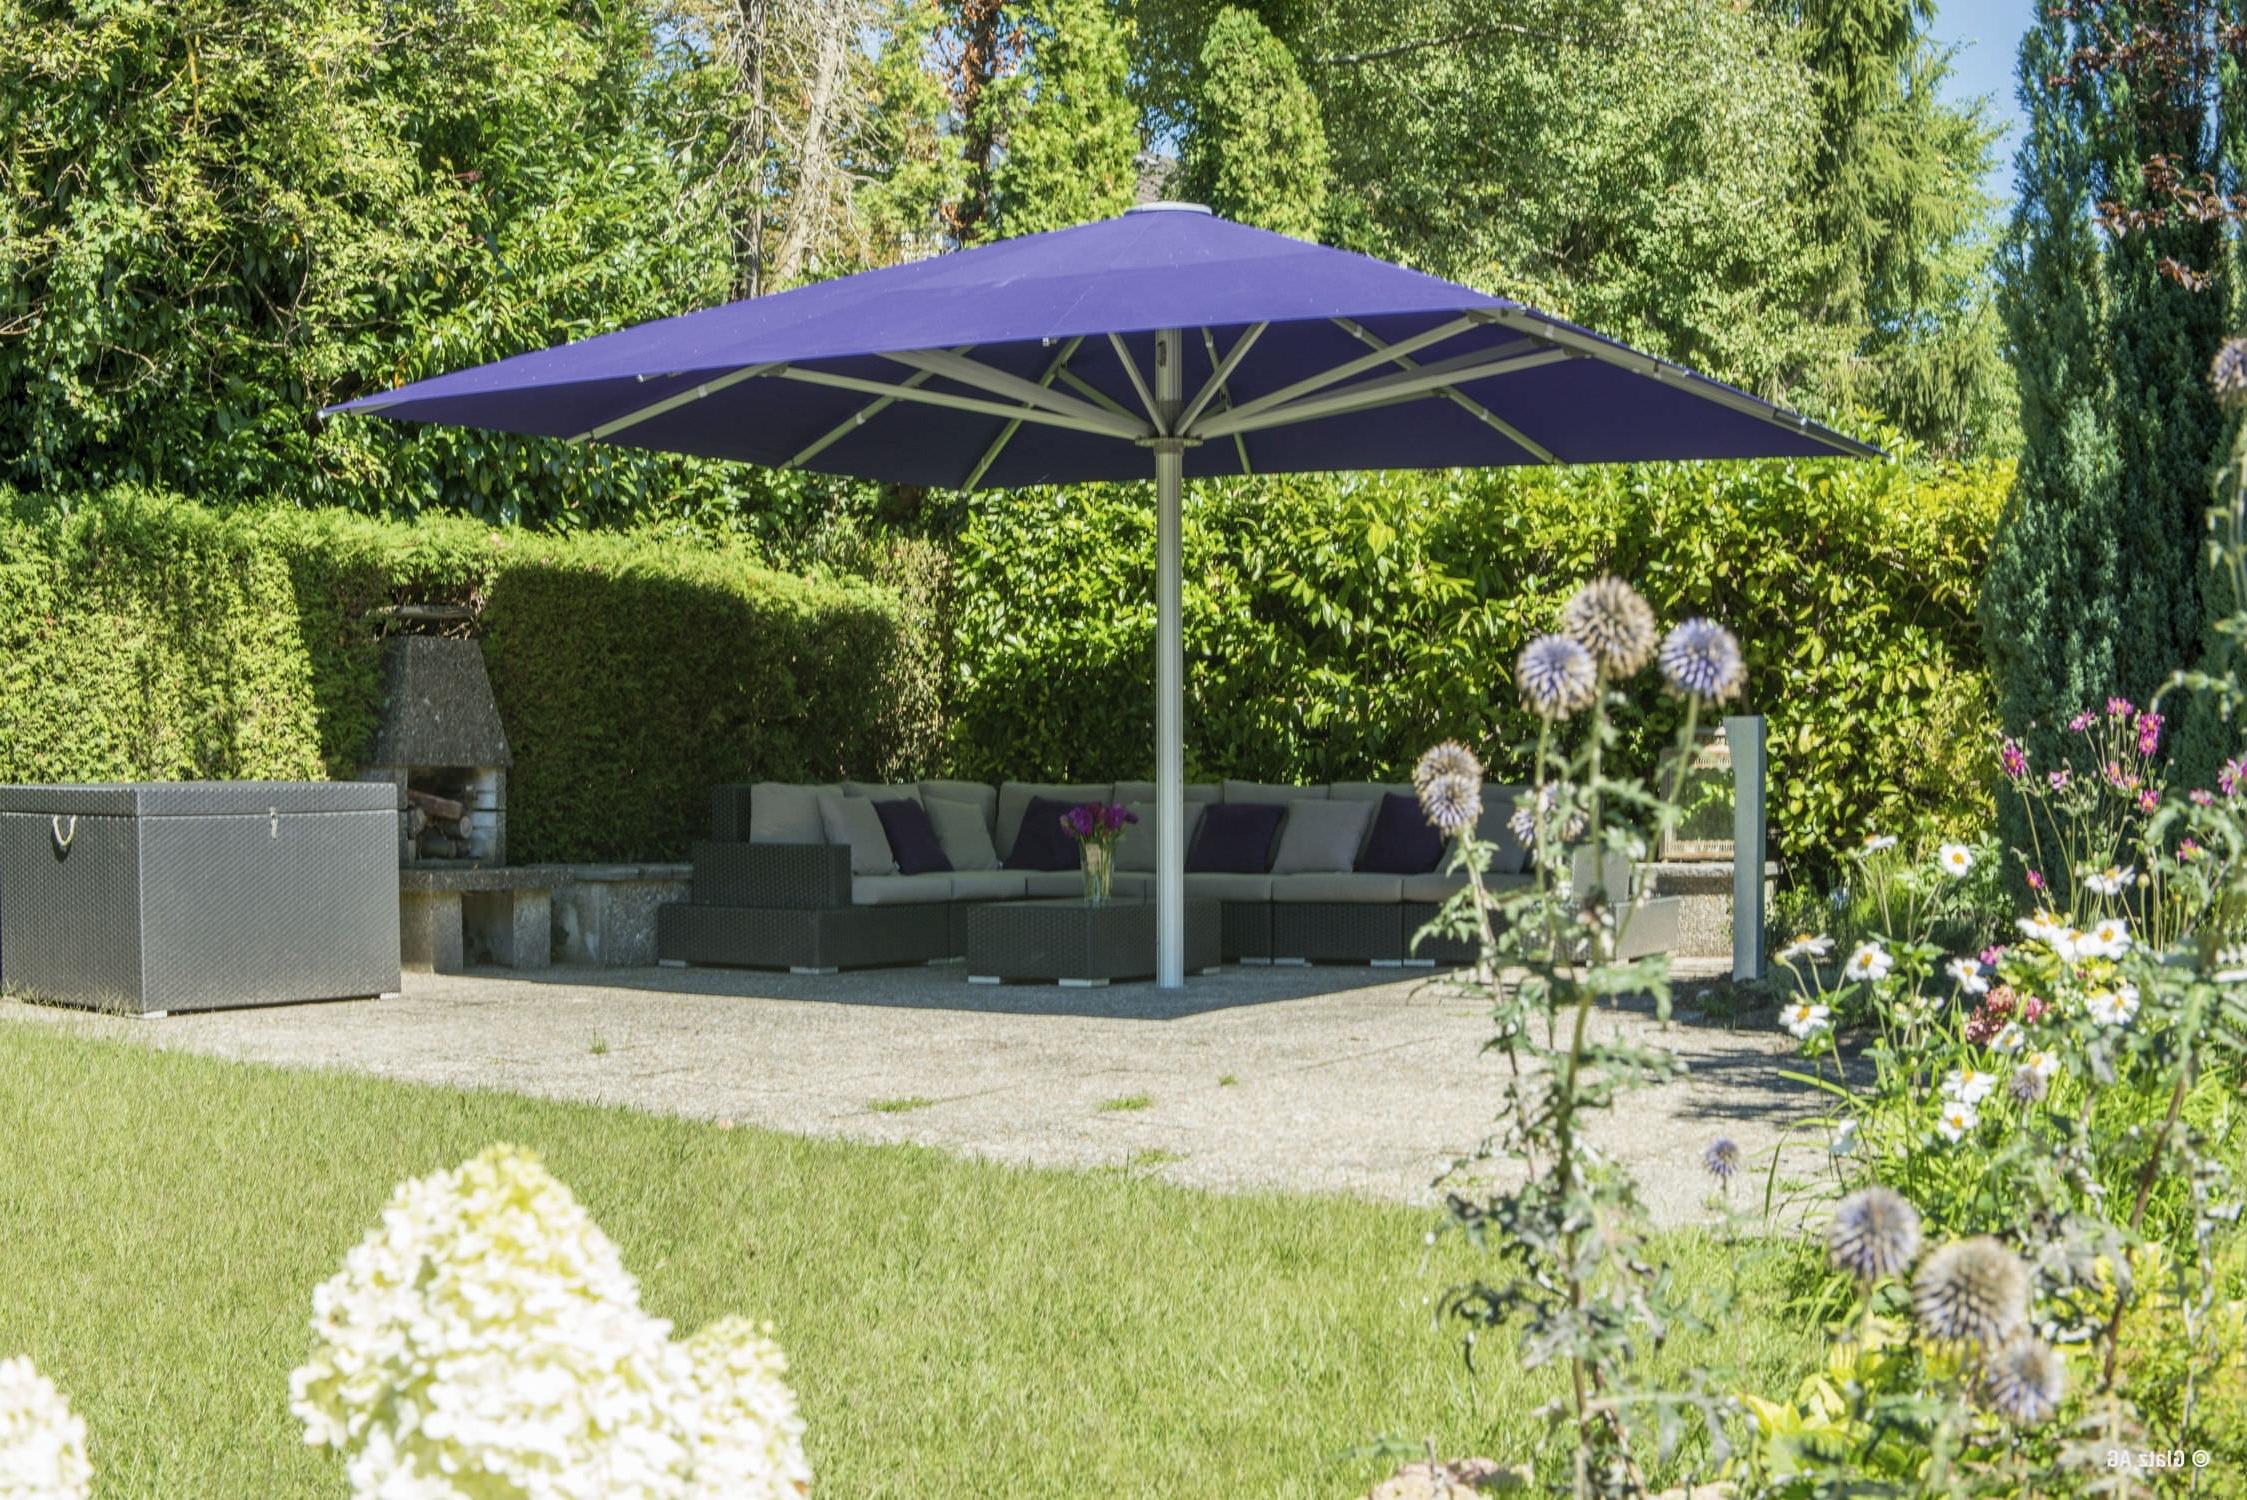 Wind Resistant Patio Umbrellas With Regard To Most Popular High Wind Patio Umbrellas • Patio Ideas (View 6 of 20)